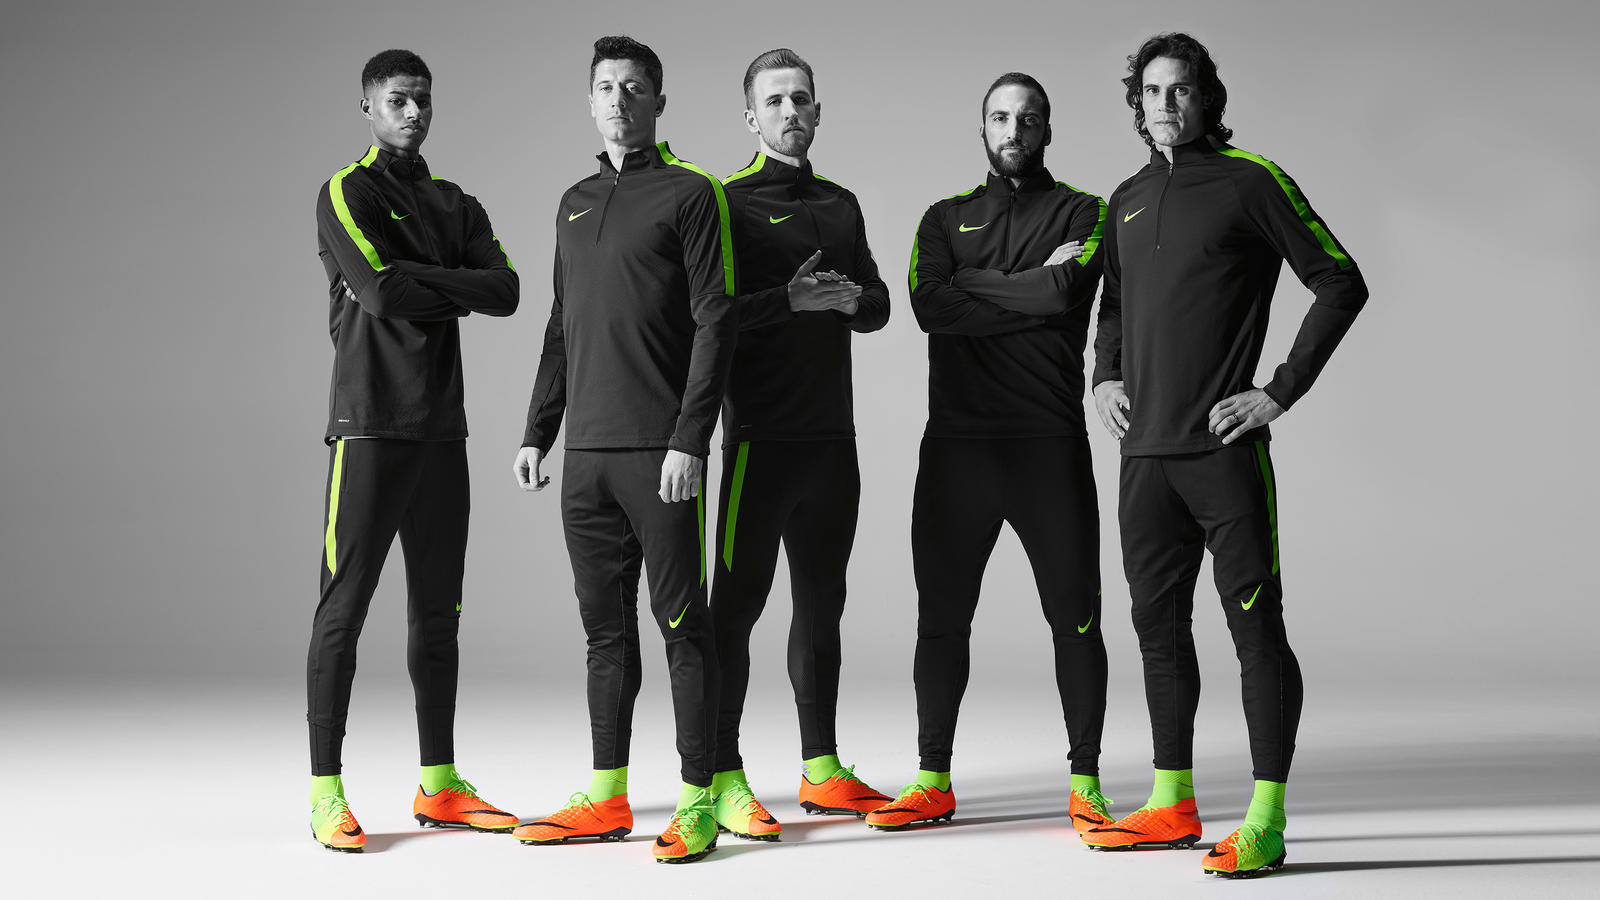 6b1db1c37 Nike hviii groupshot wide 2 hd 1600